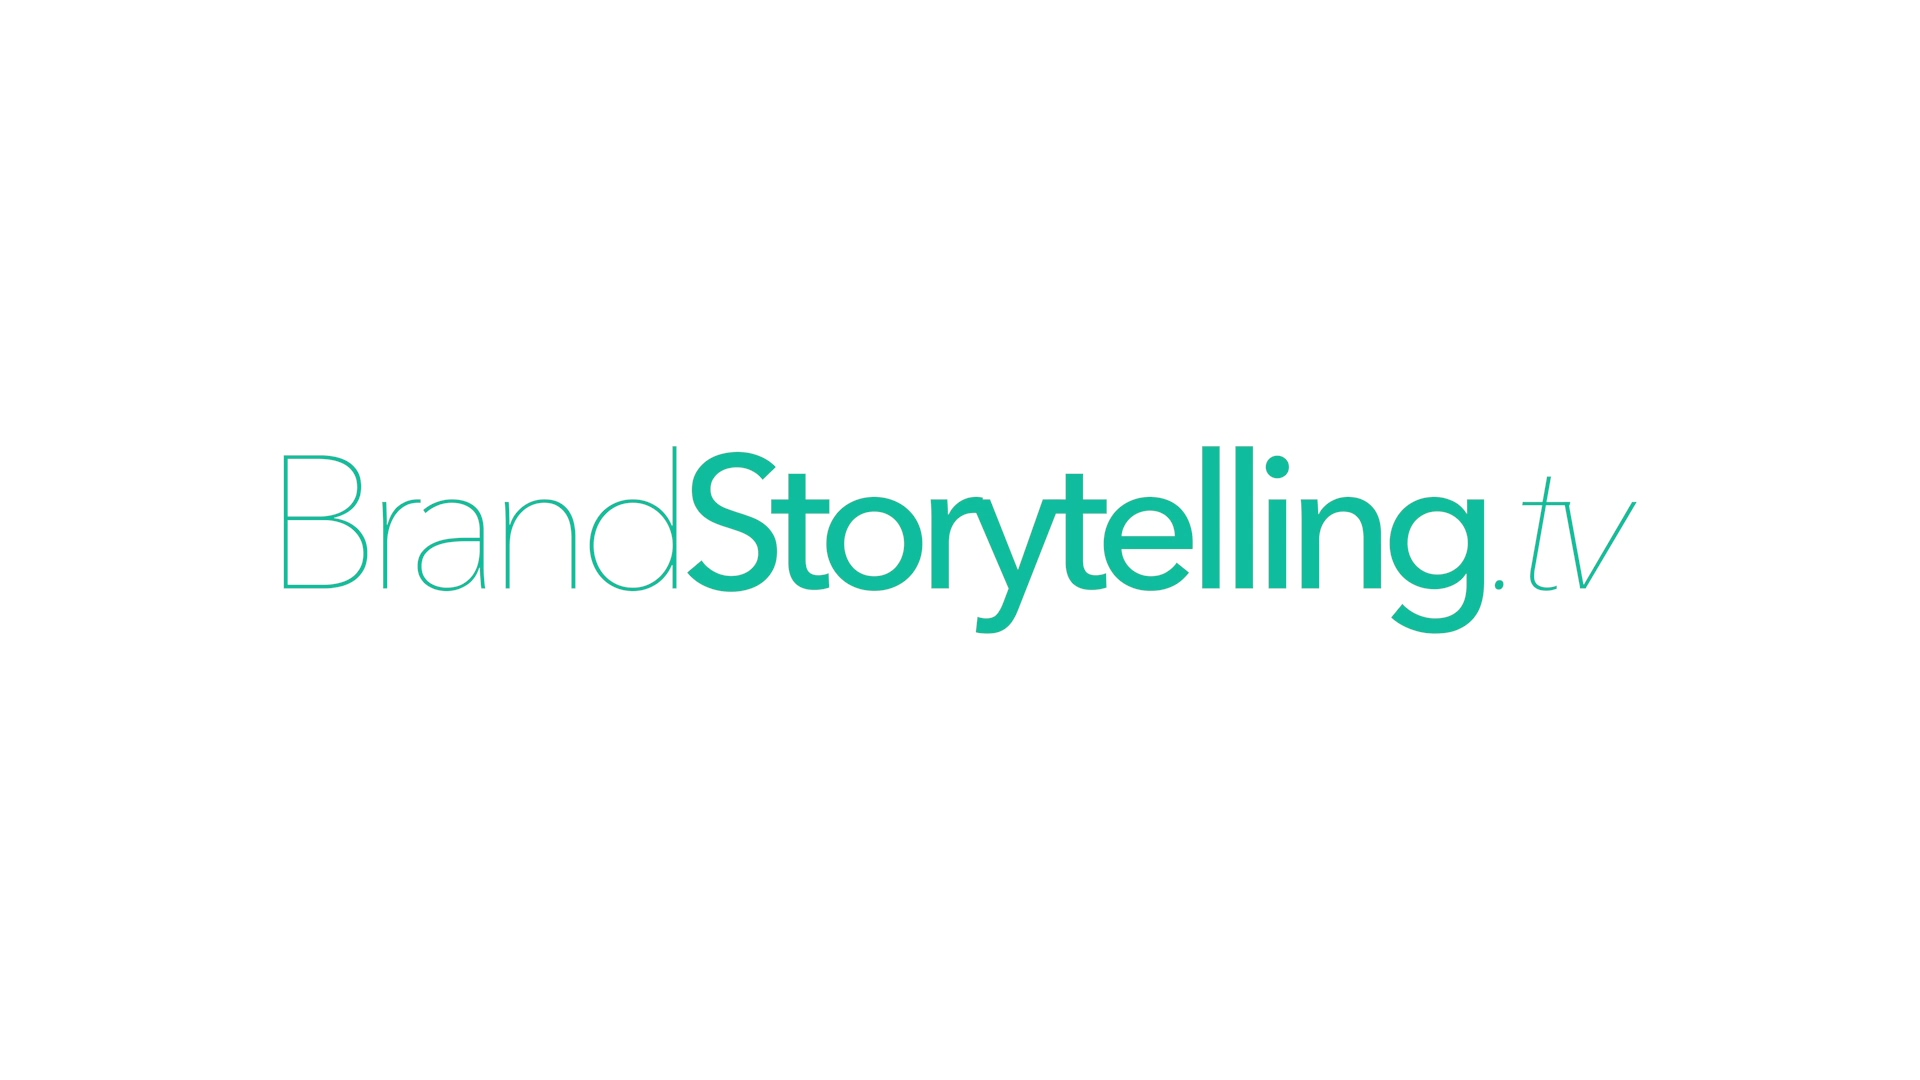 Brandstorytelling Sundance Wattpad INTV FINAL 062019 H264